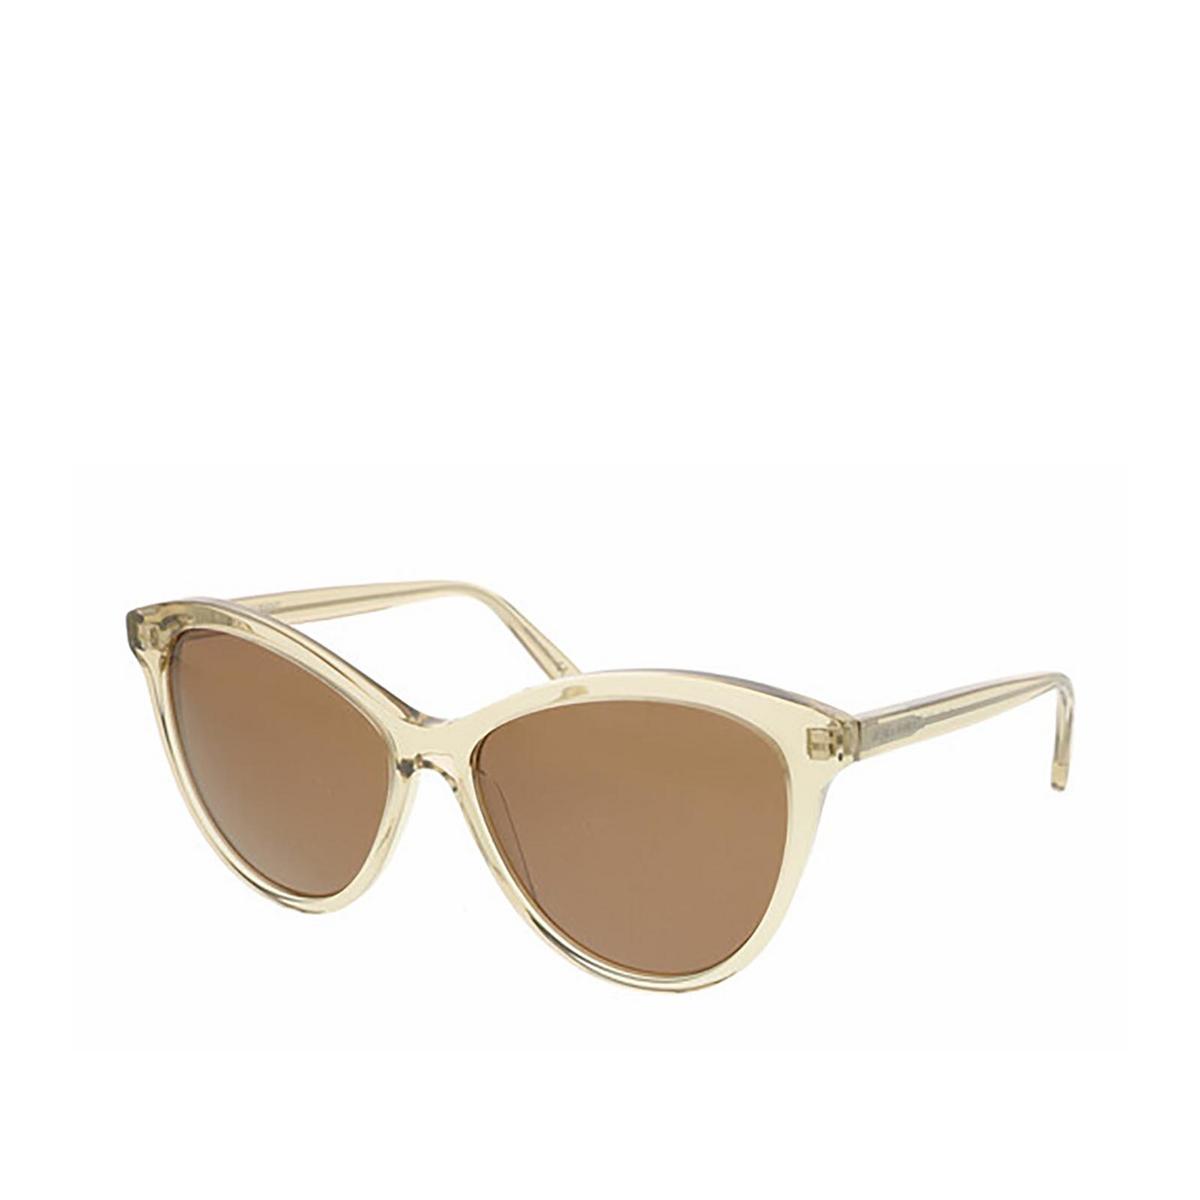 Saint Laurent® Cat-eye Sunglasses: SL 456 color Transparent Yellow 004 - three-quarters view.